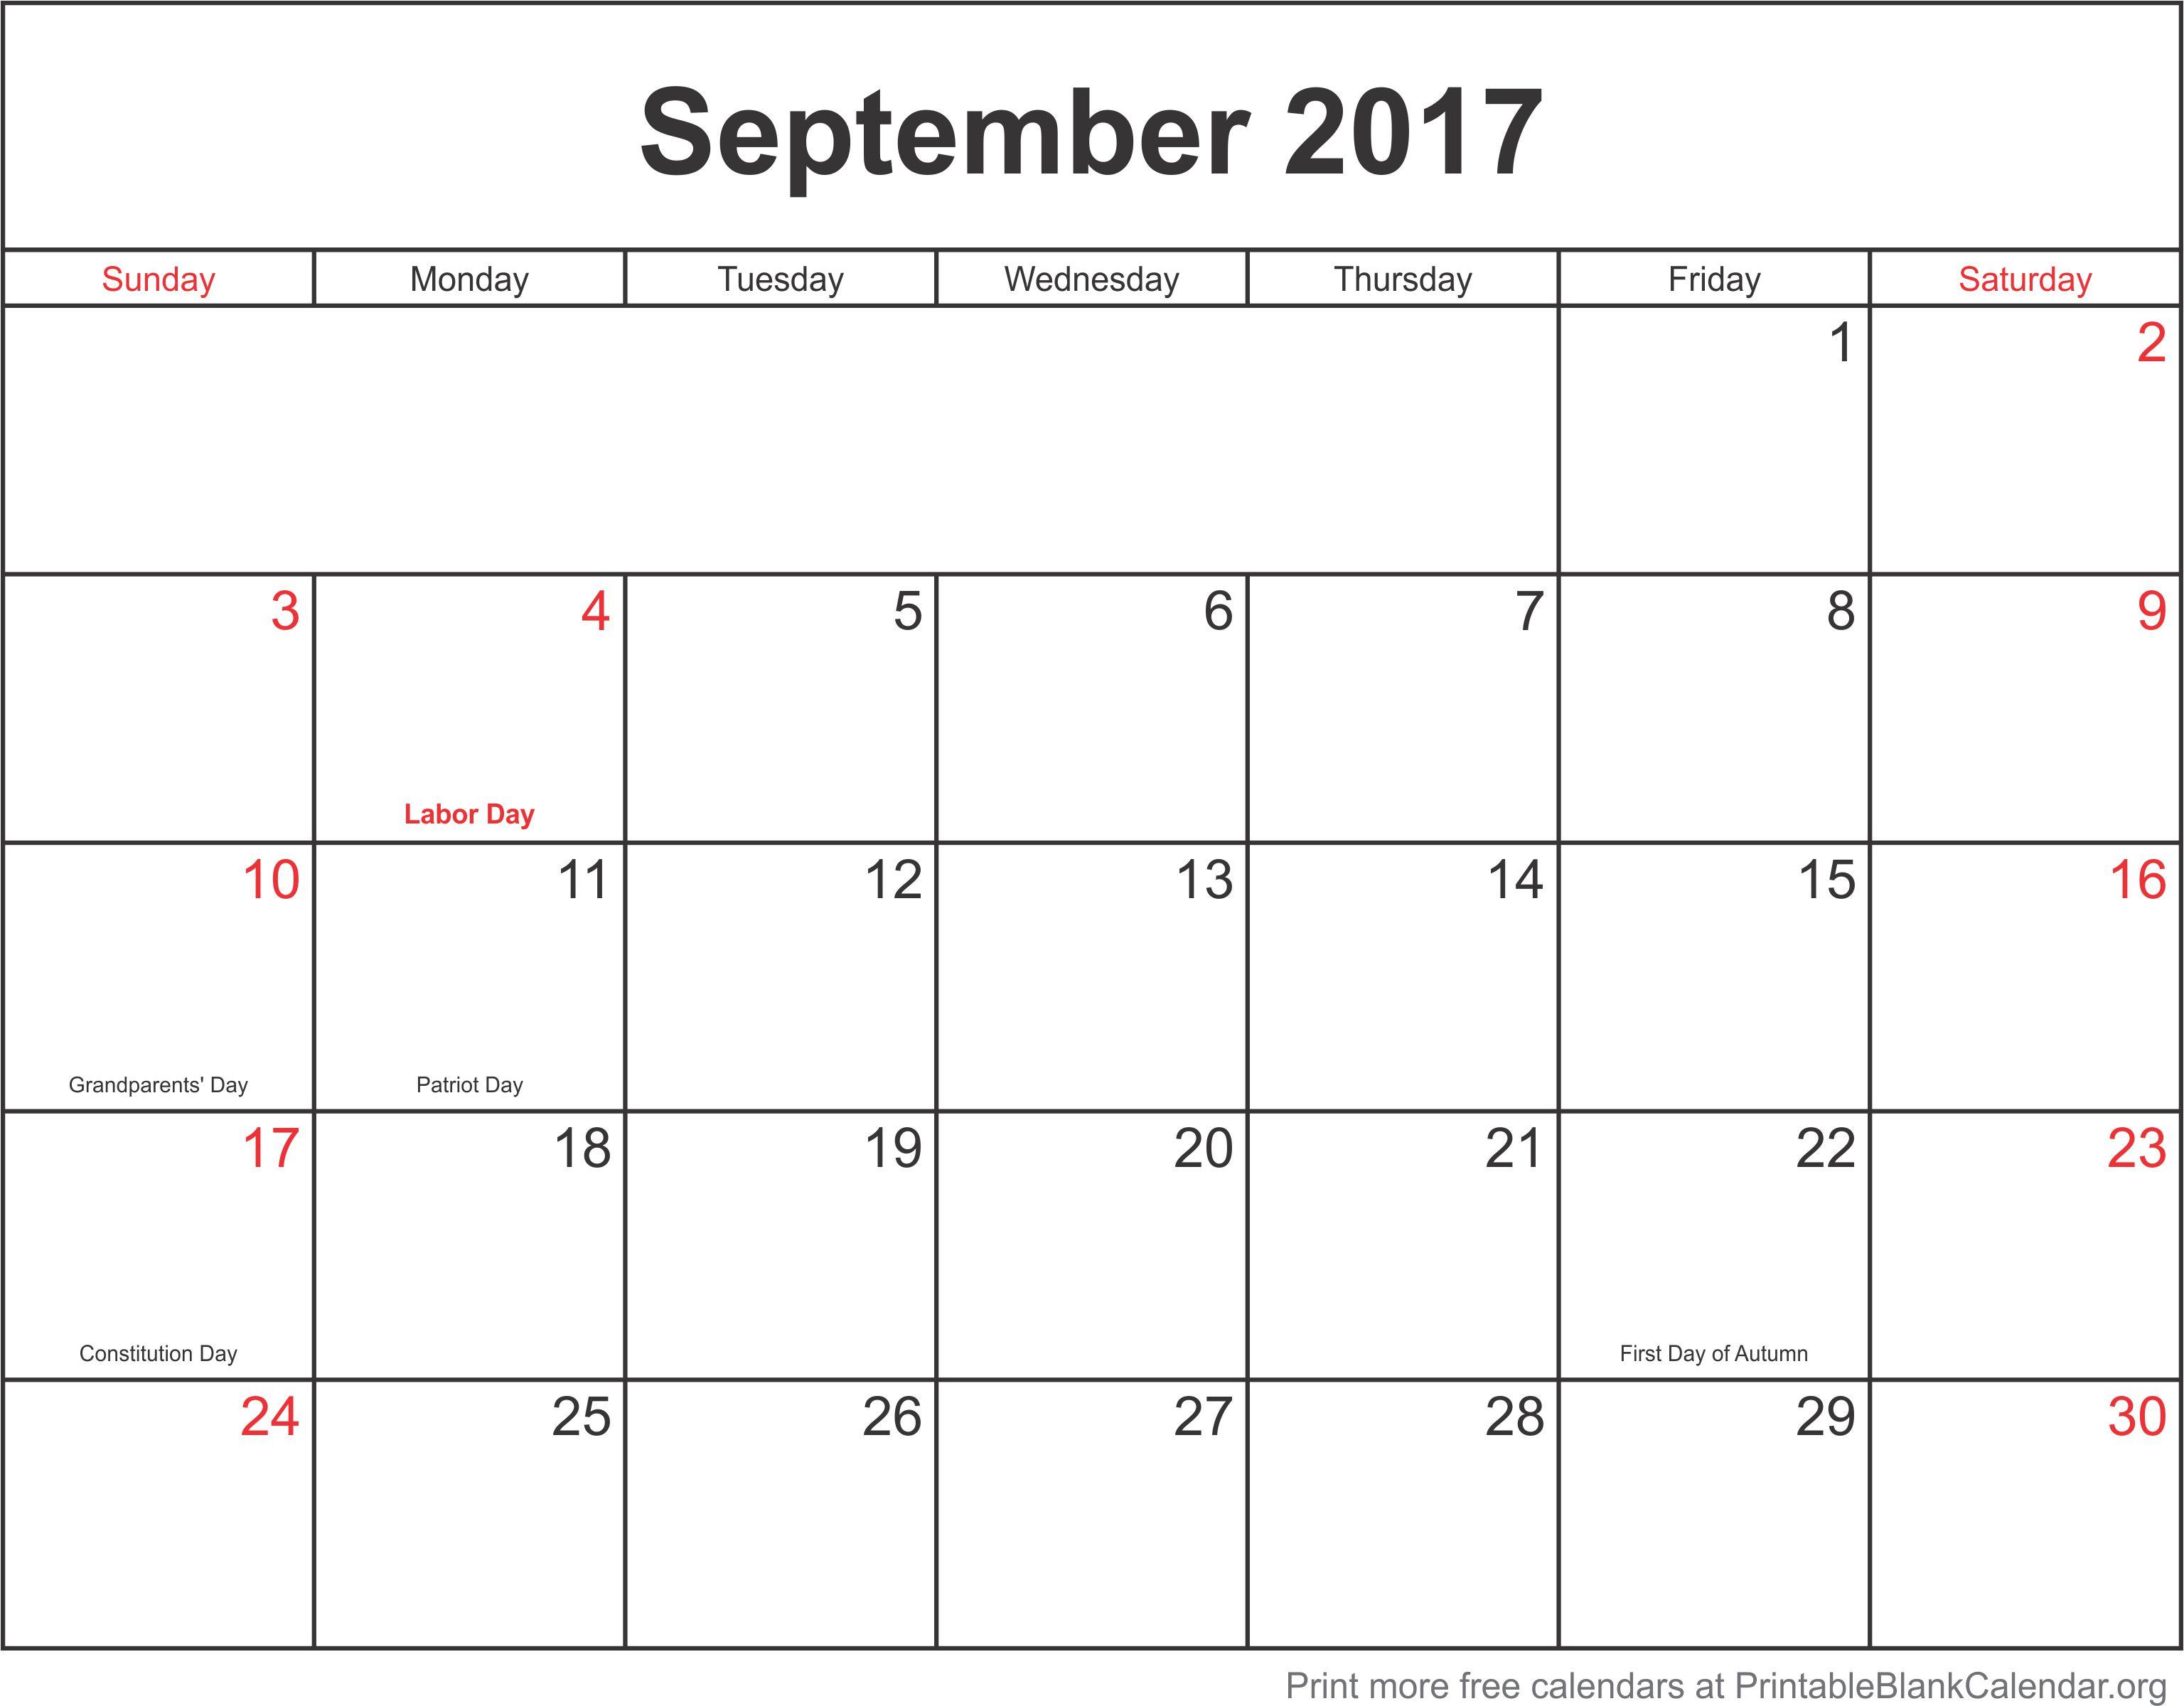 Printable Blank Calendar.org - Free calendar templates